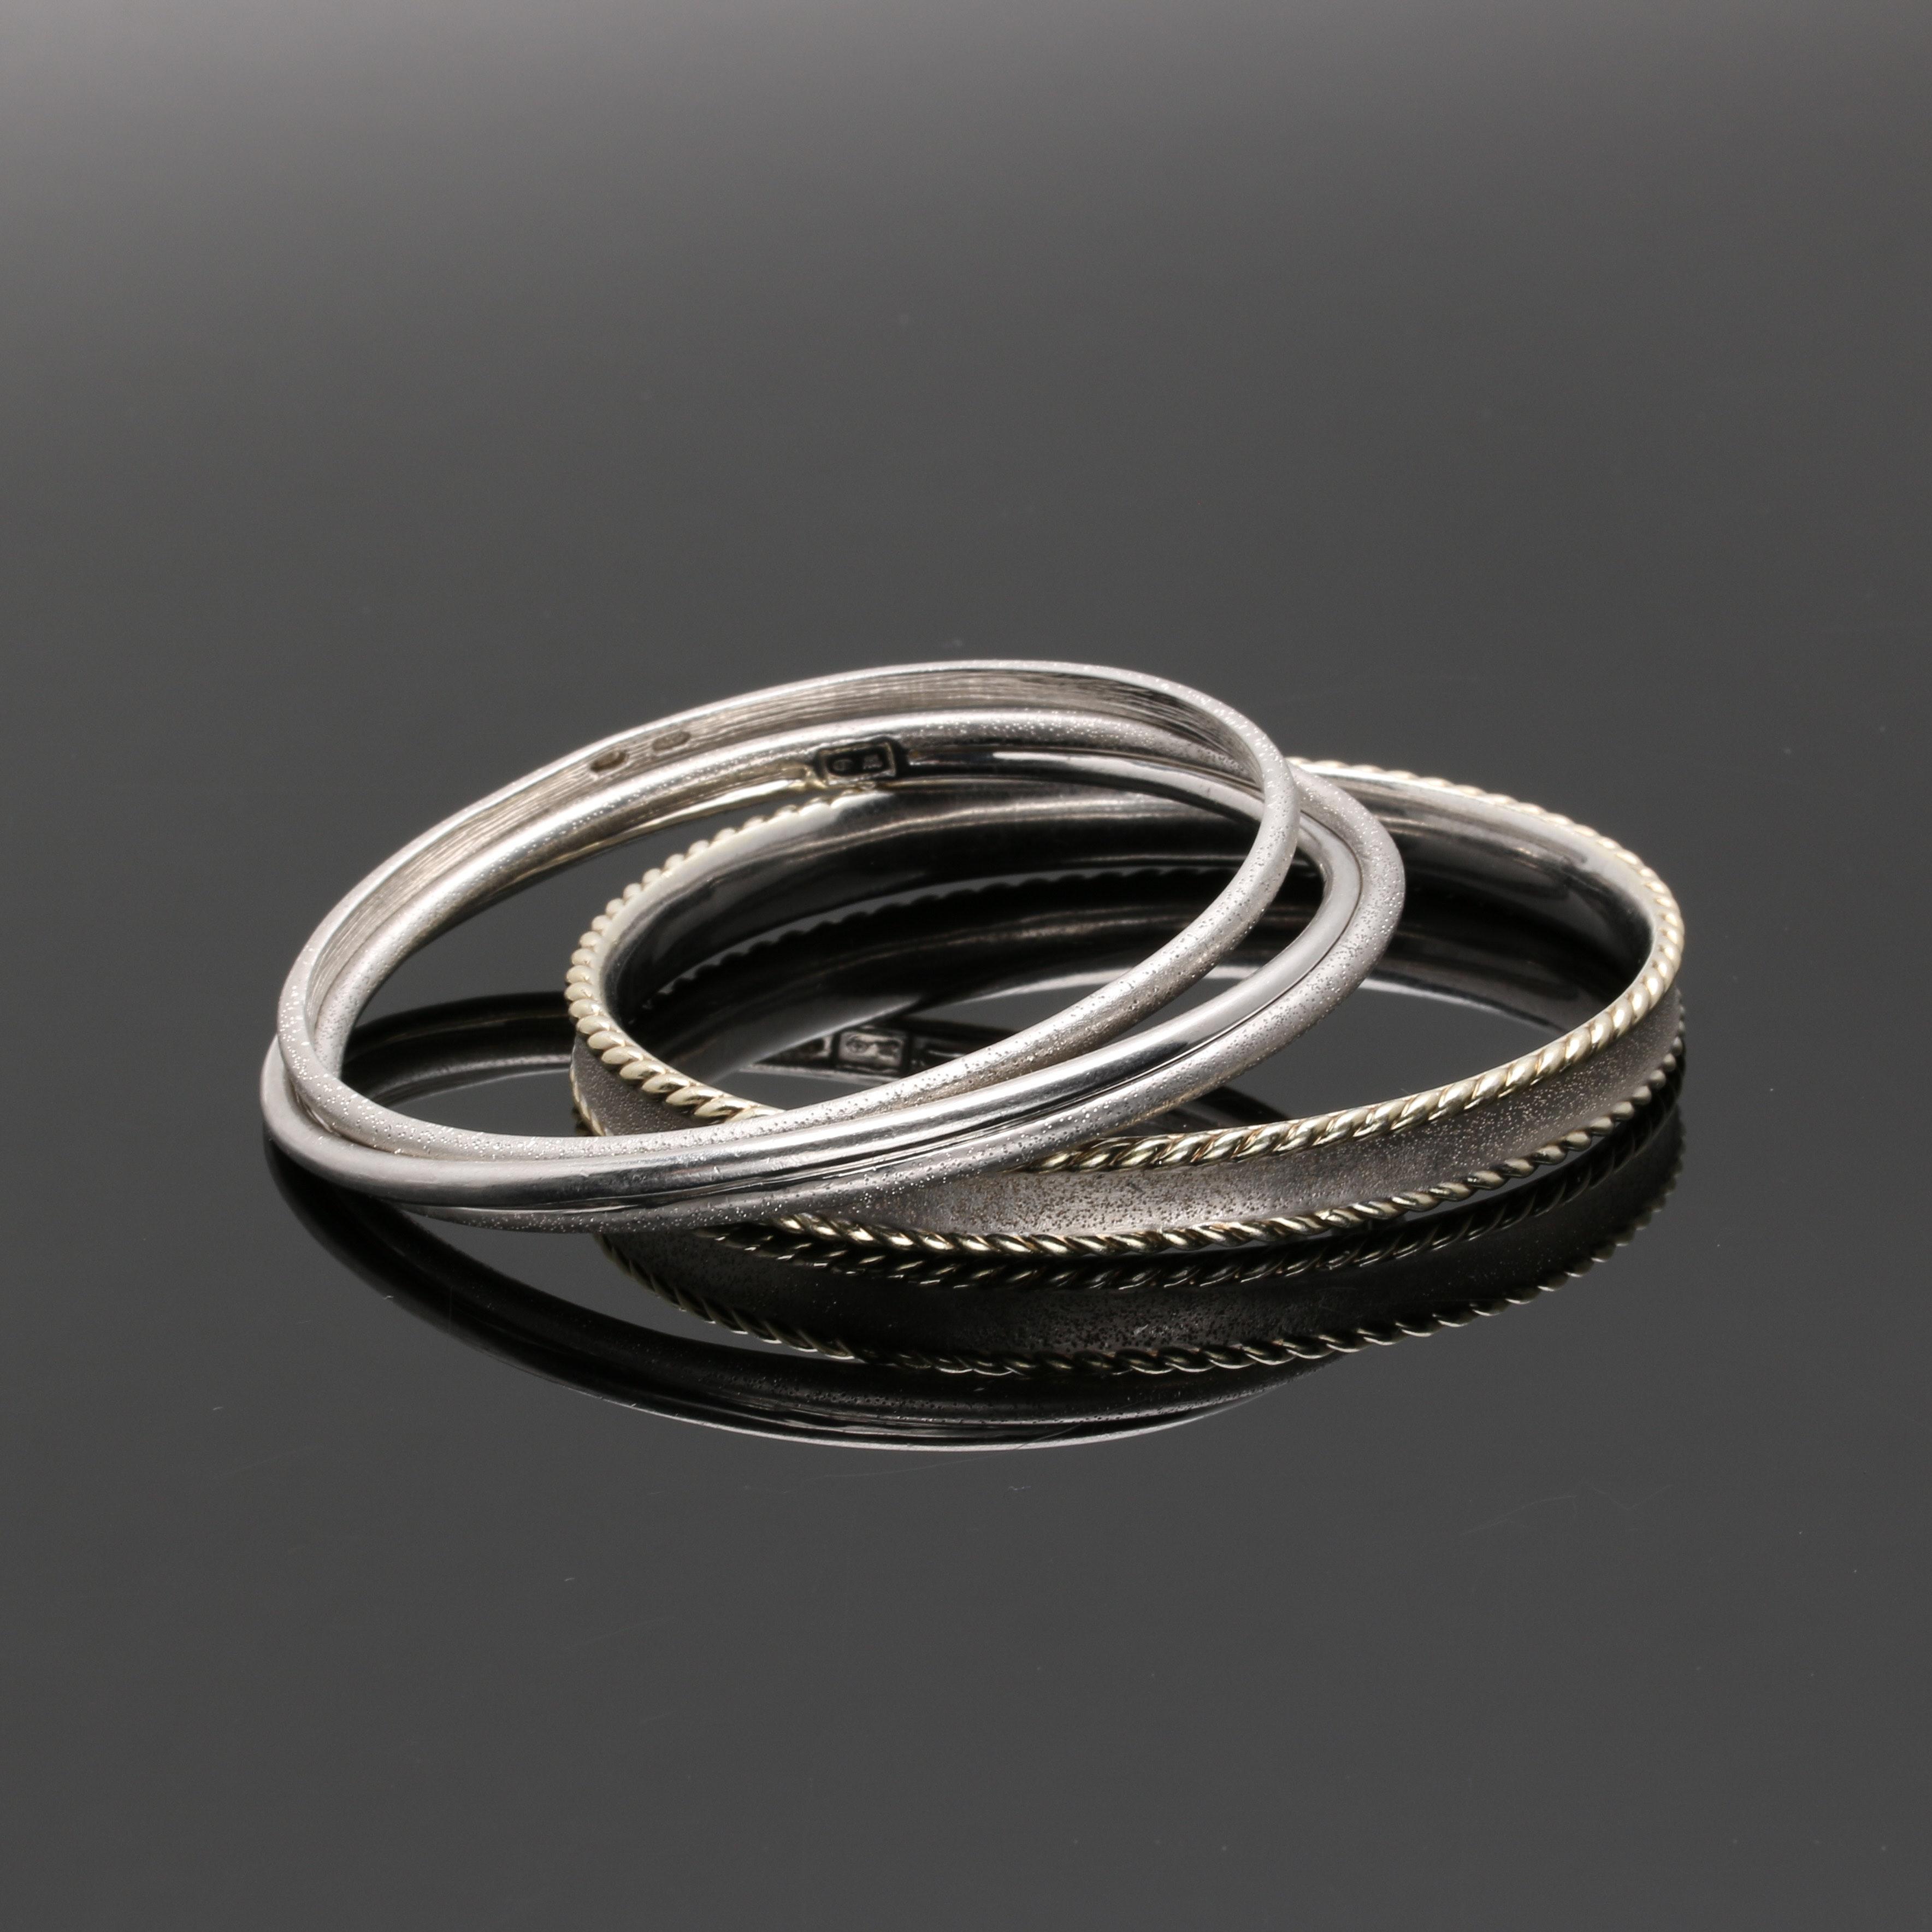 Charles Garnier Sterling Silver Bangle Bracelets